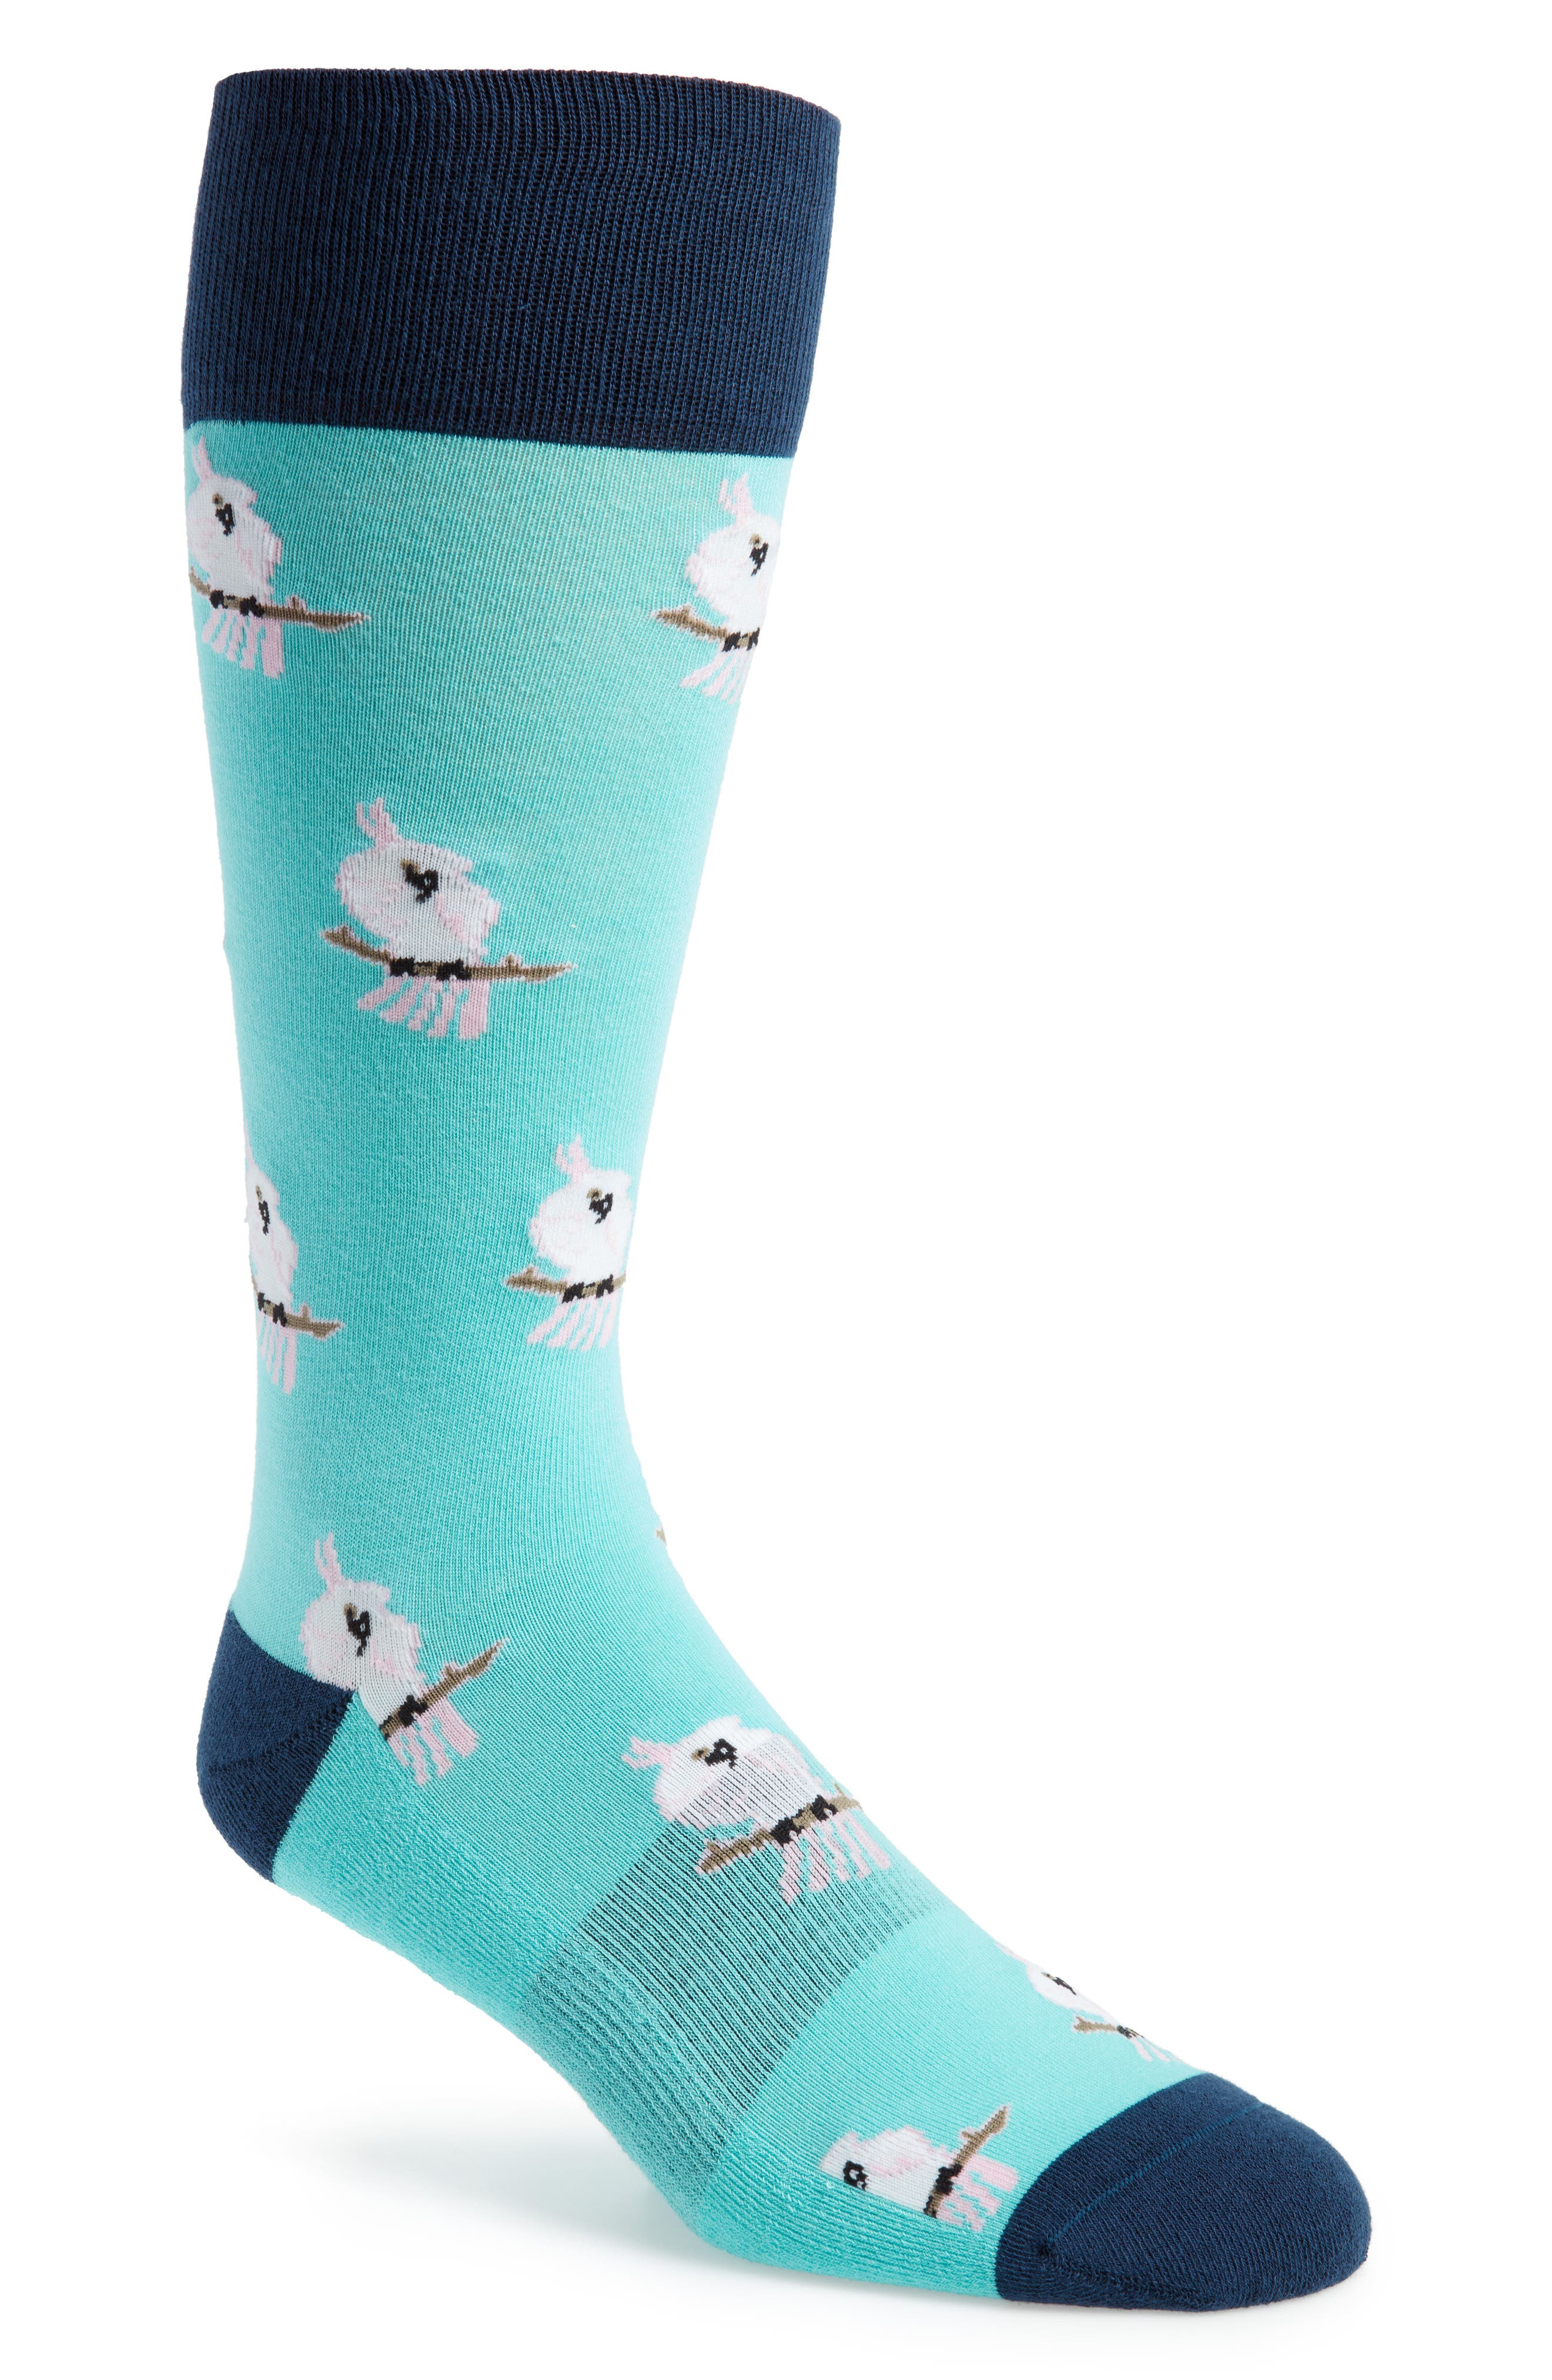 Nordstrom Men's Shop Cockatoo Socks